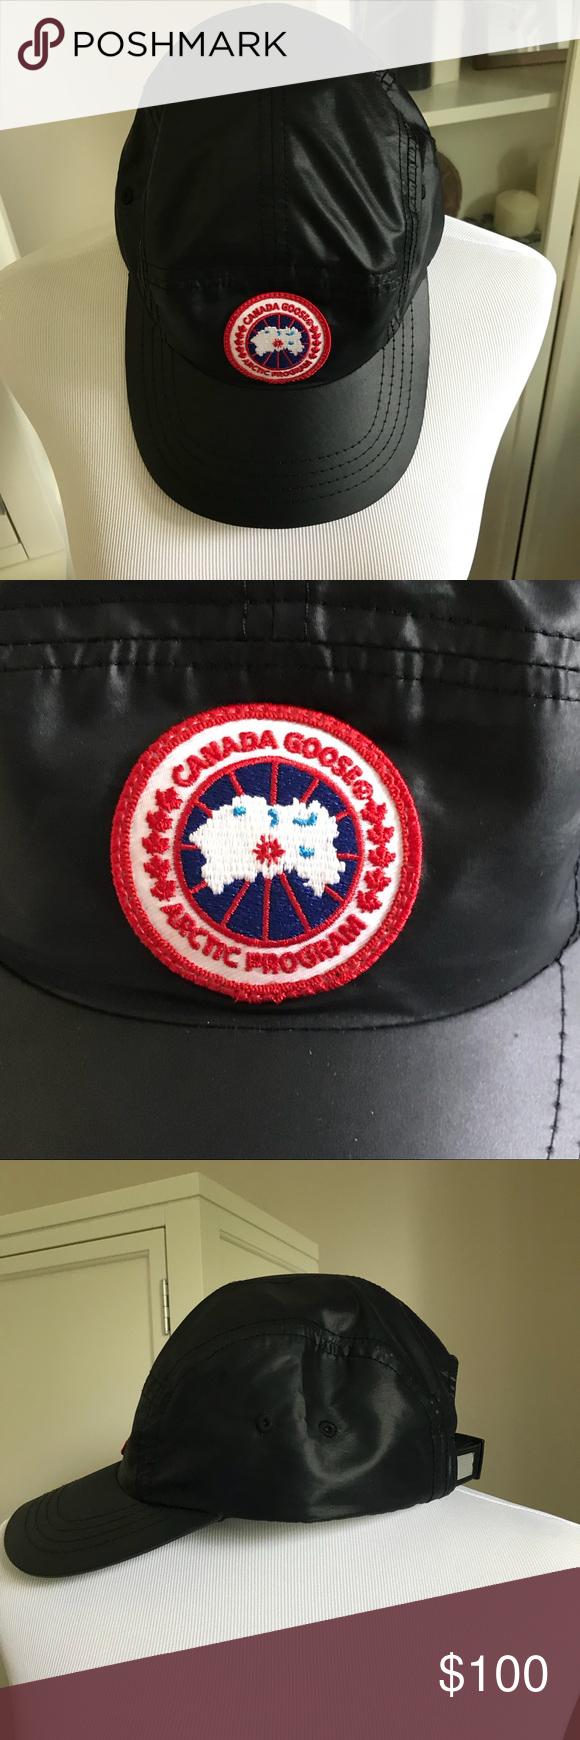 62e178eb3d3 Canada Goose x Concepts Black Nylon Ball Cap Hat